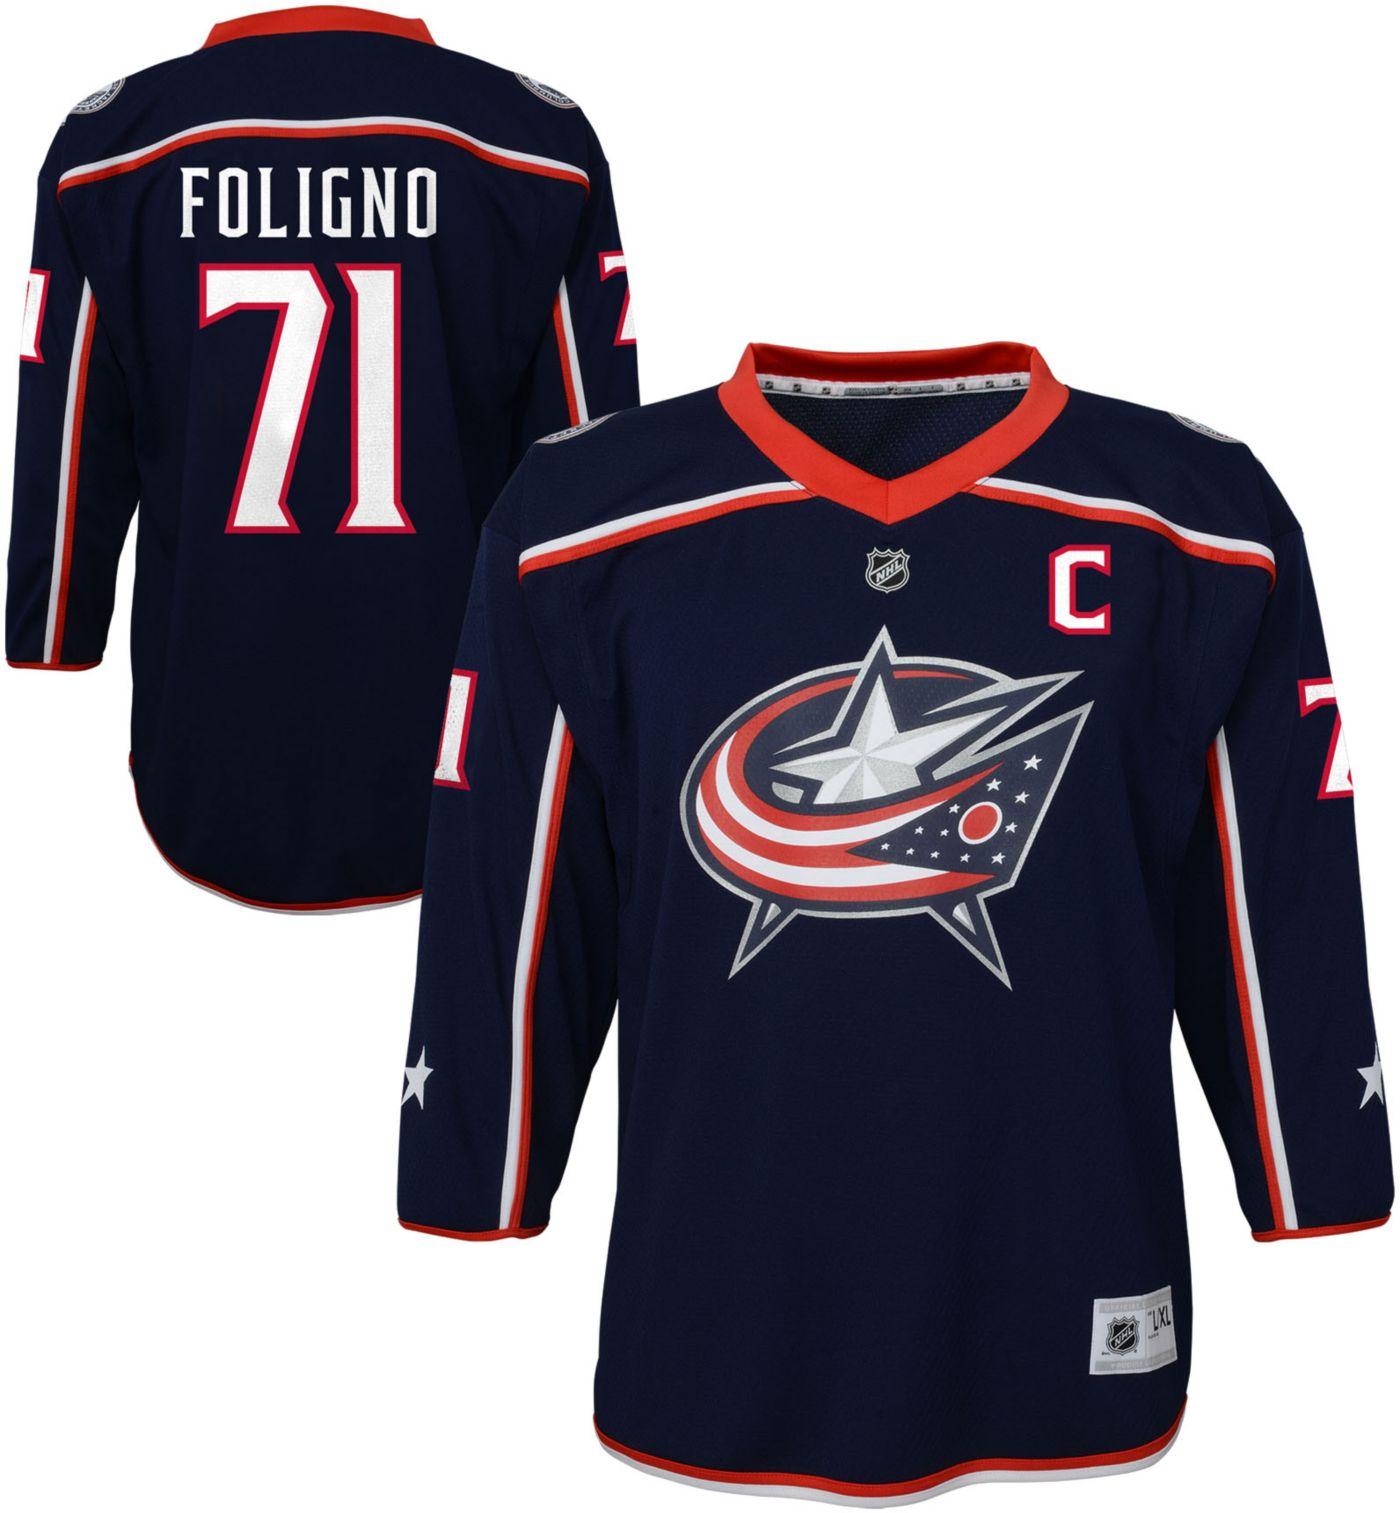 NHL Youth Columbus Blue Jackets Nick Foligno #71 Replica Home Jersey